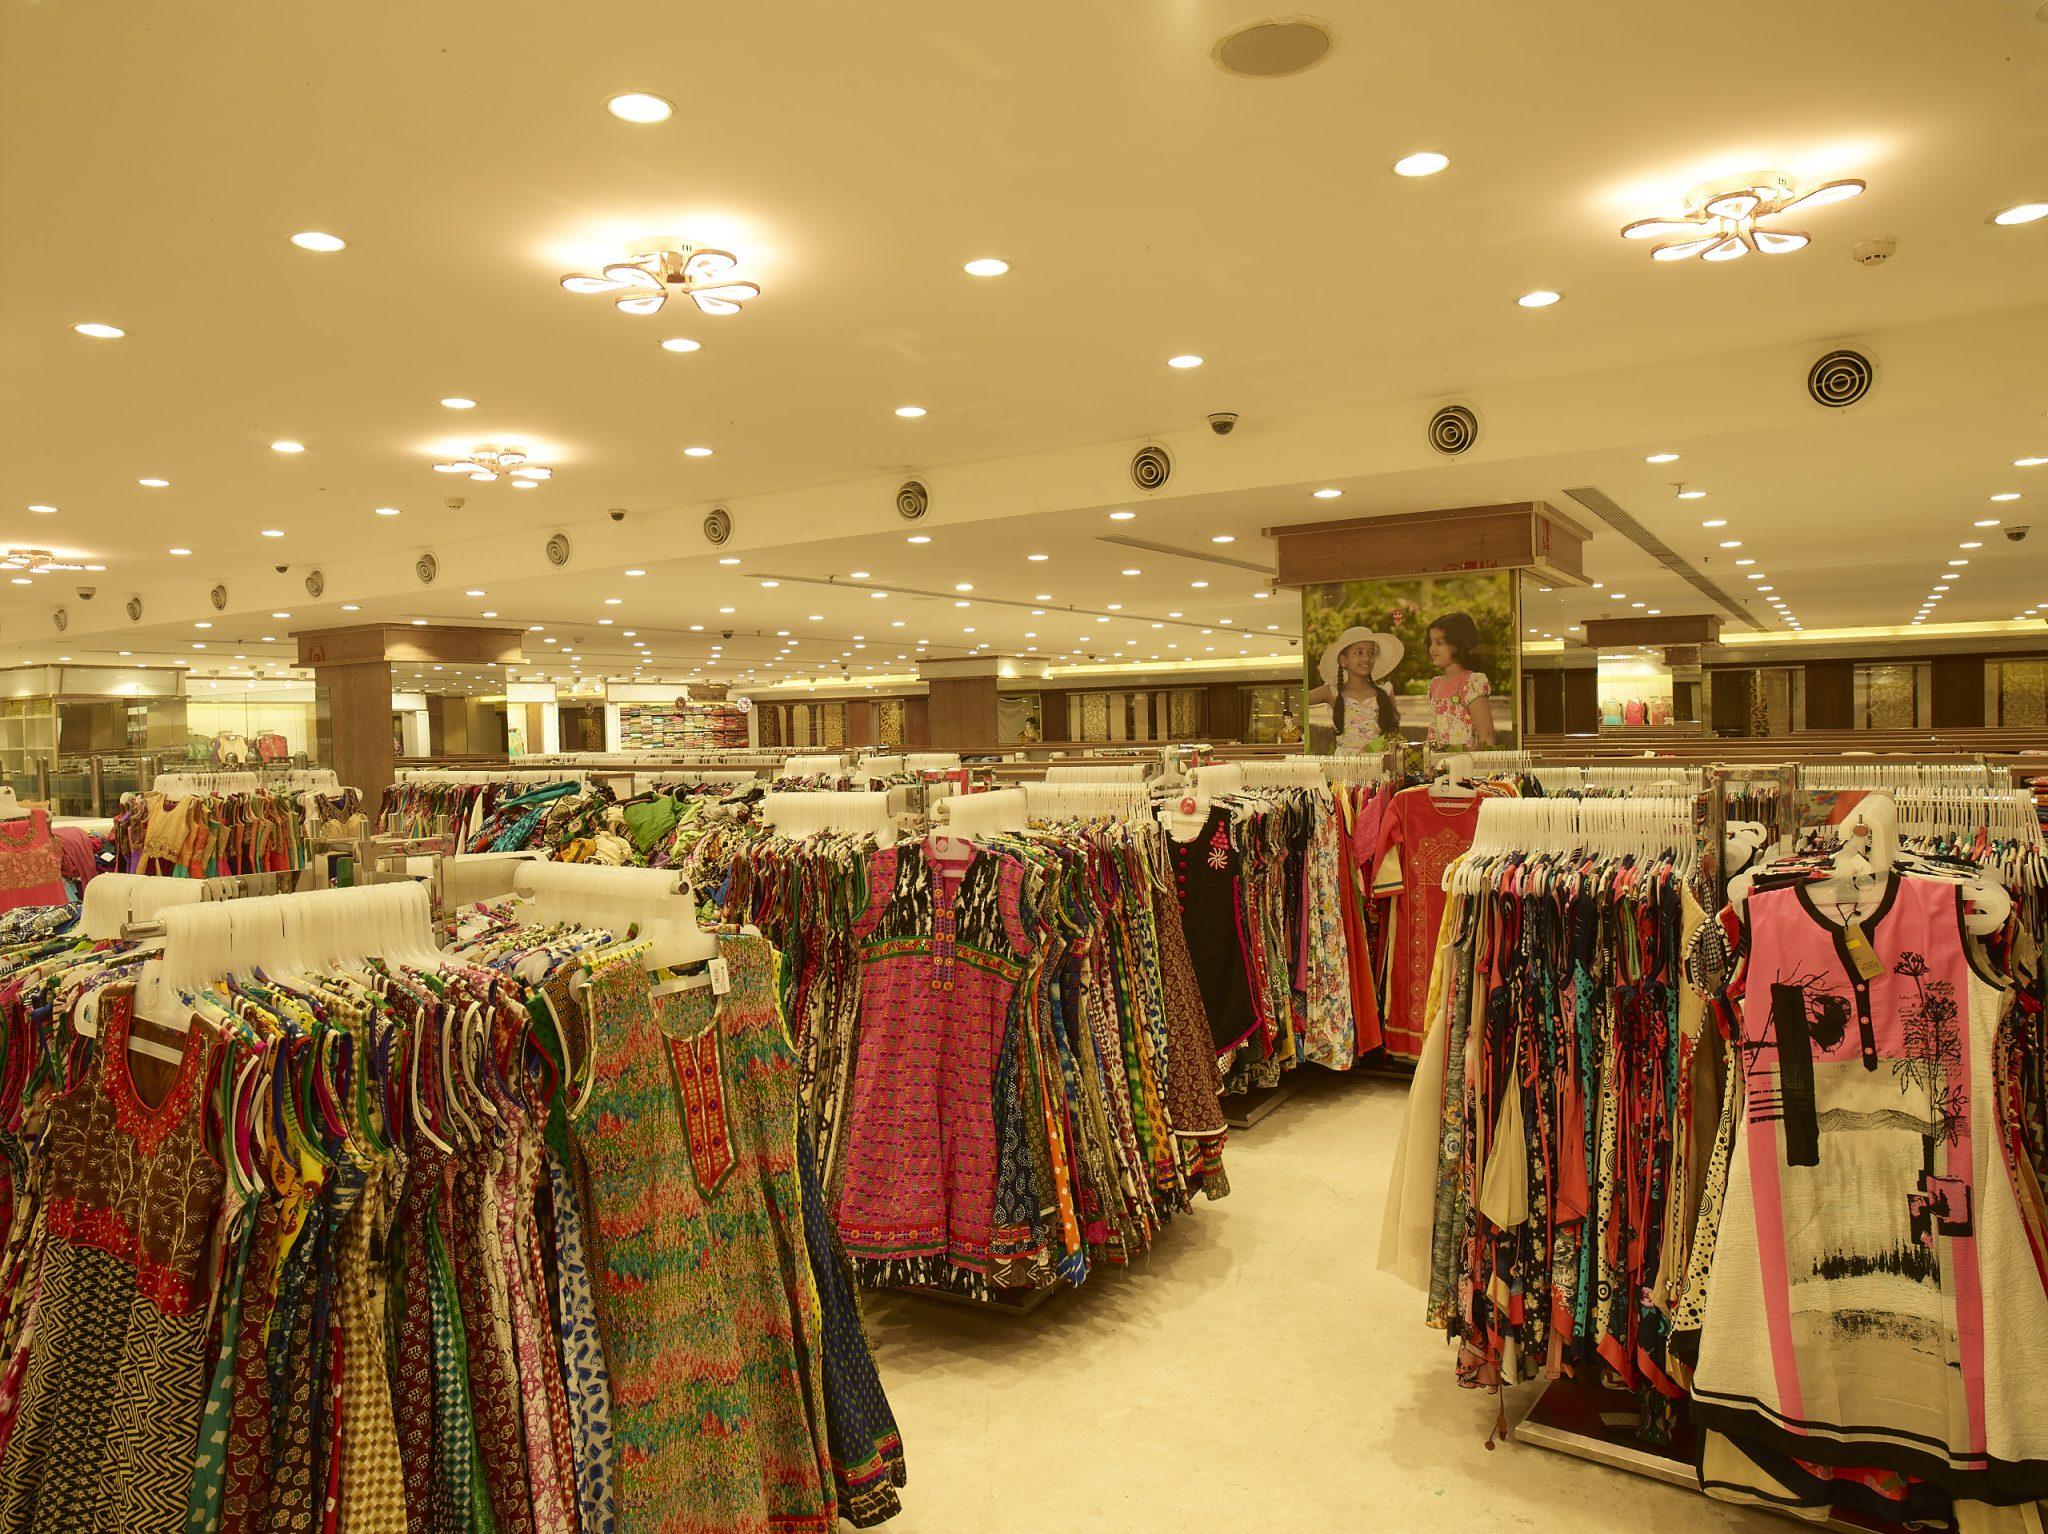 saravana stores Interior22882